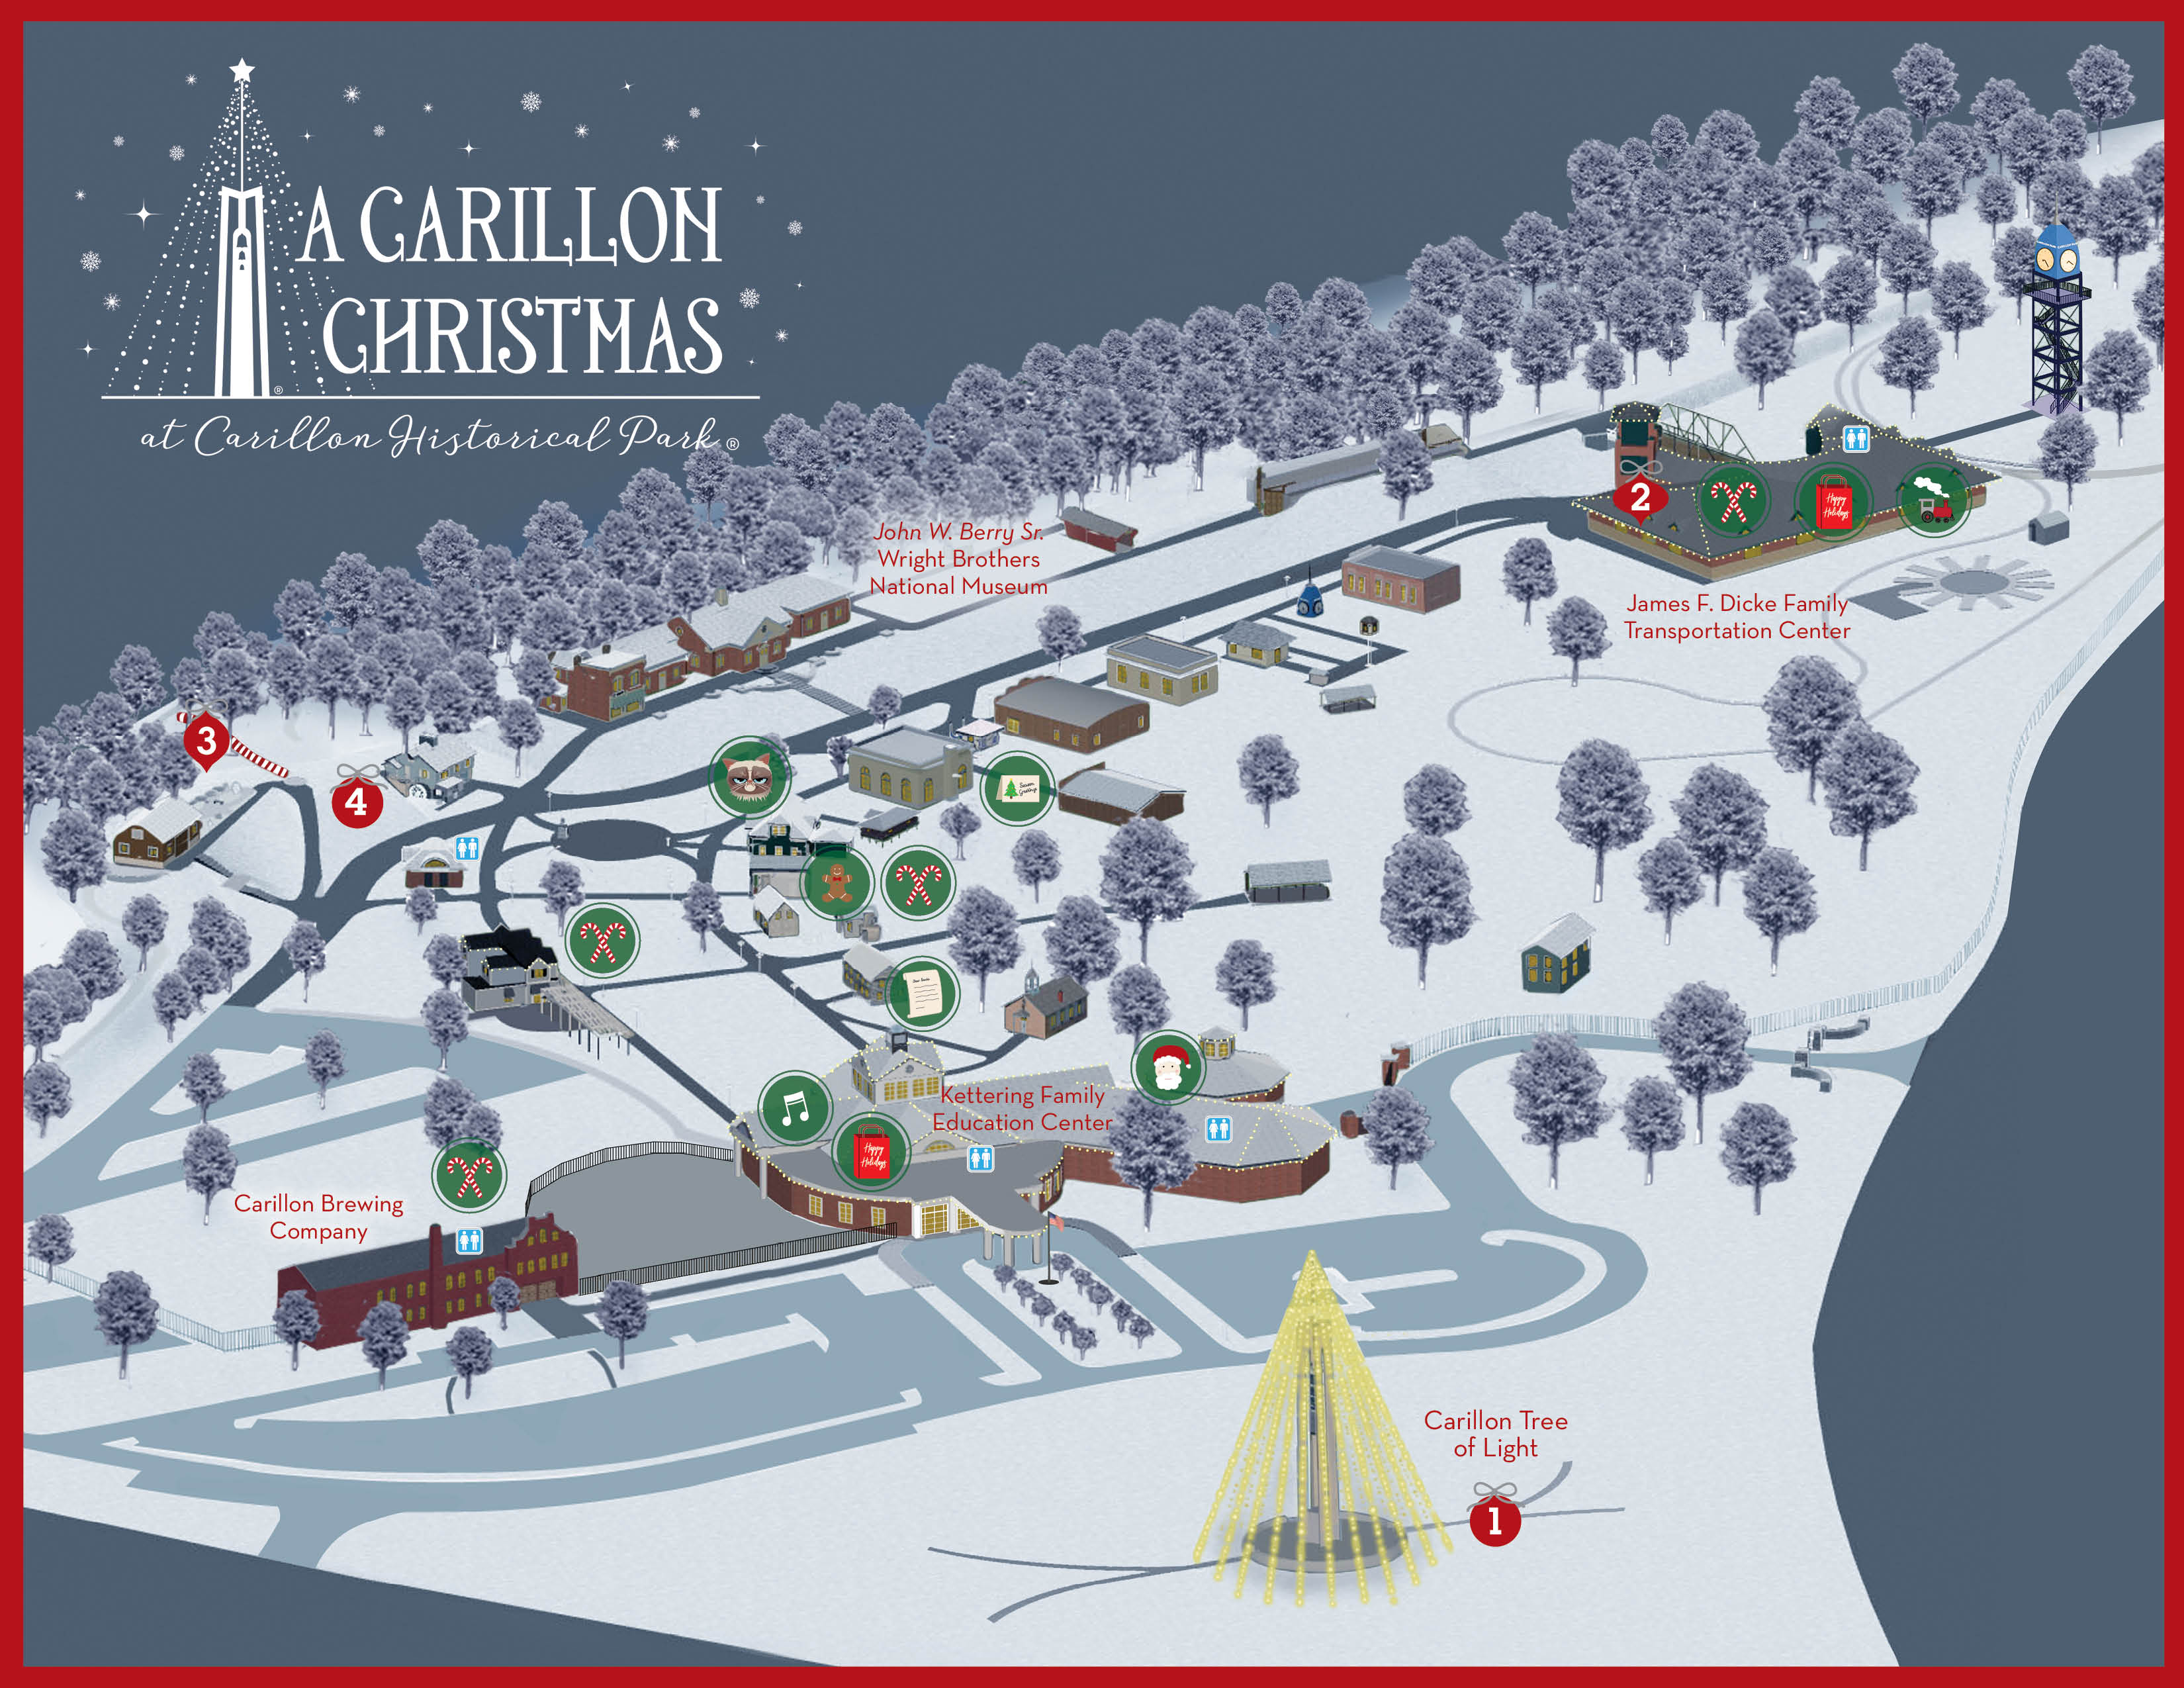 A Carillon Christmas Dayton History